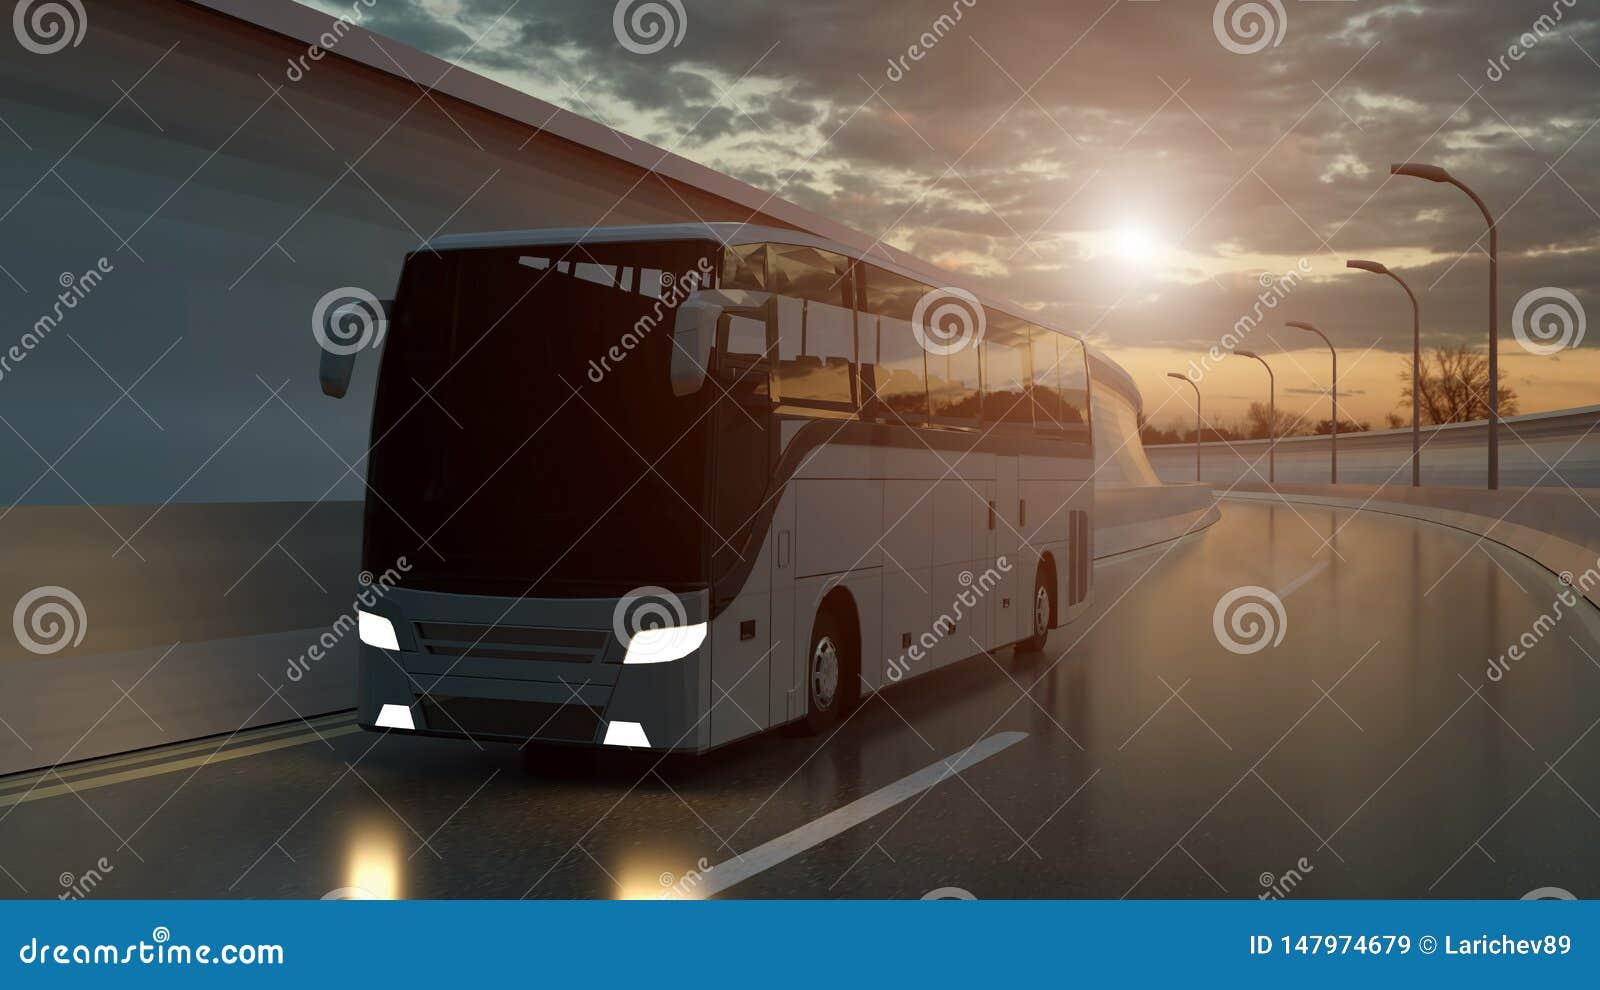 Turist- vit buss som k?r p? en huvudv?g p? solnedg?ngen som ?r bakbelyst vid en ljus orange sunburst under en illavarslande molni